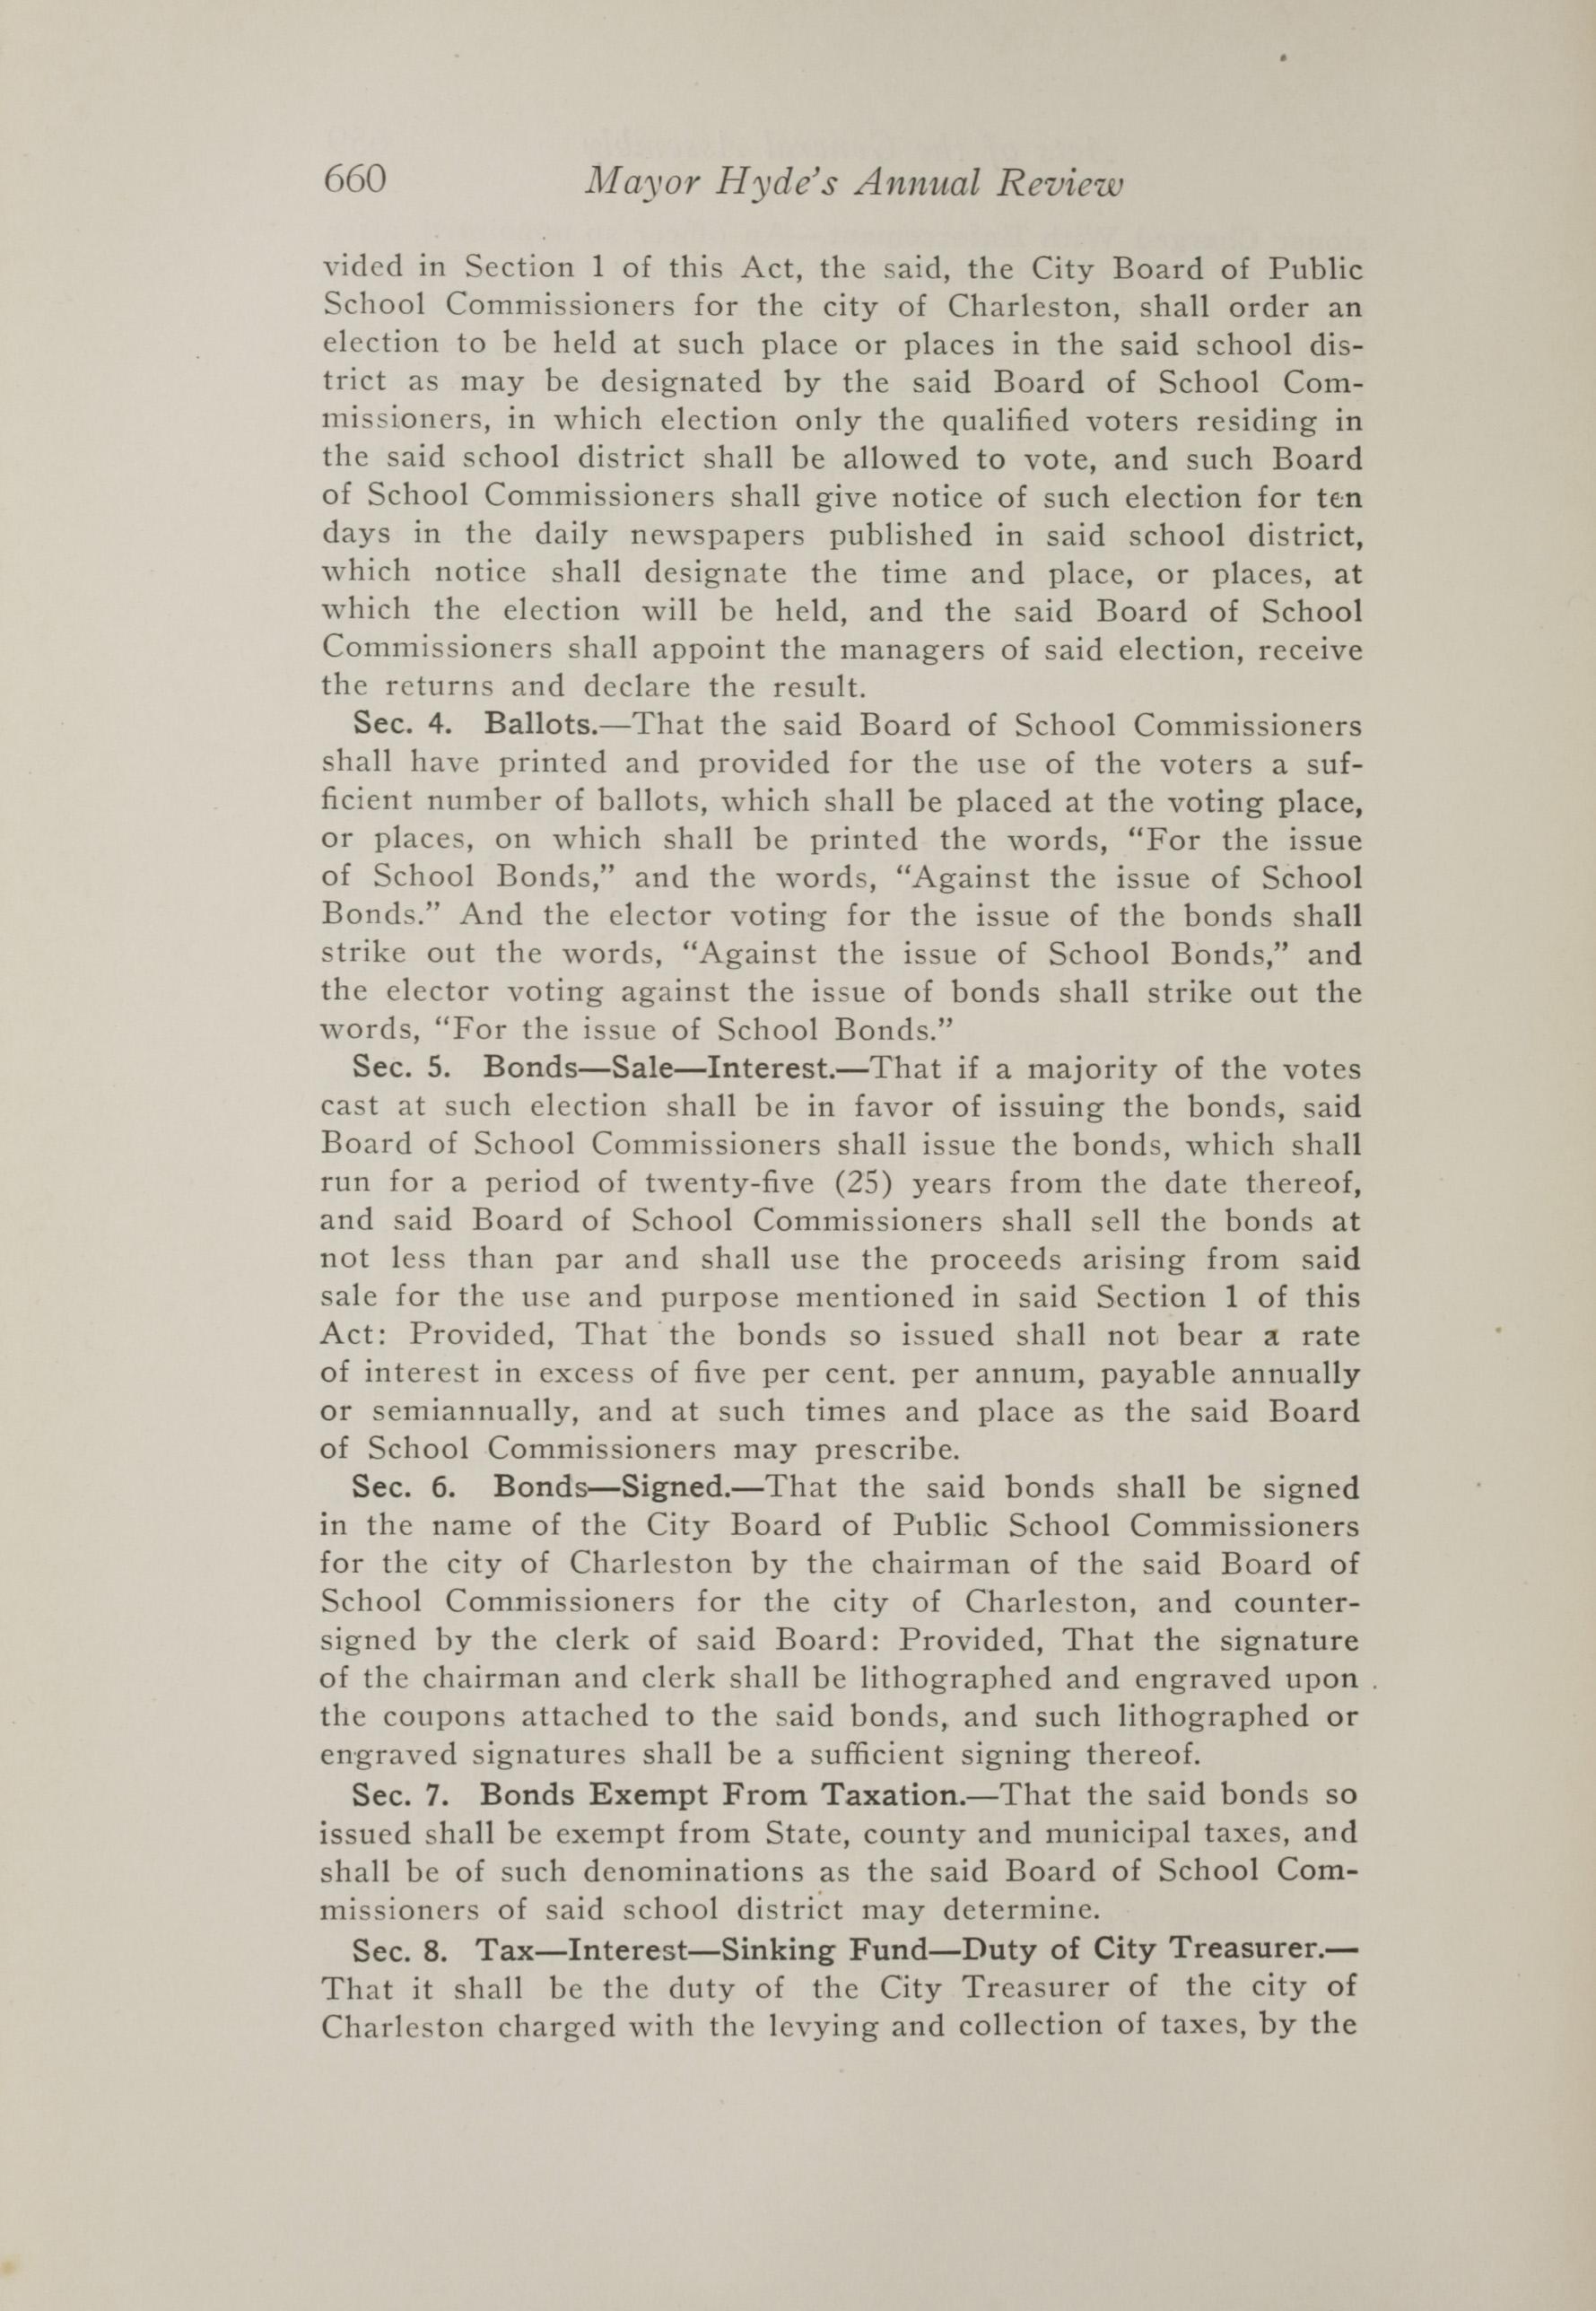 Charleston Yearbook, 1917, page 660